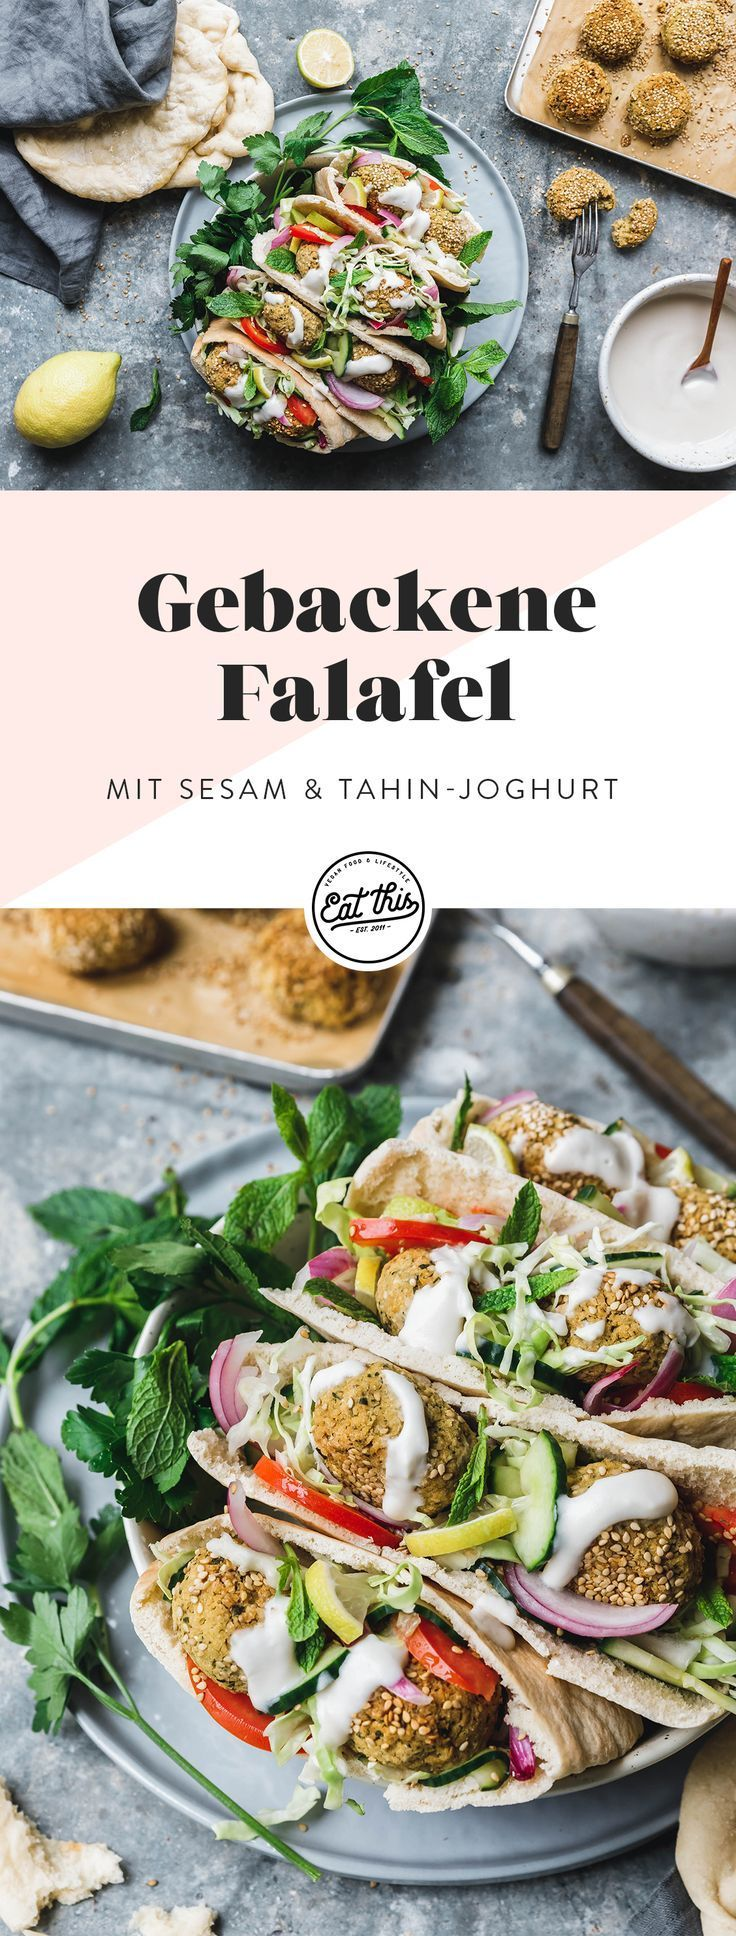 Gebackene Falafel mit Sesam & Tahin-Joghurt · Eat this! Foodblog • Vegane Rezepte • Stories